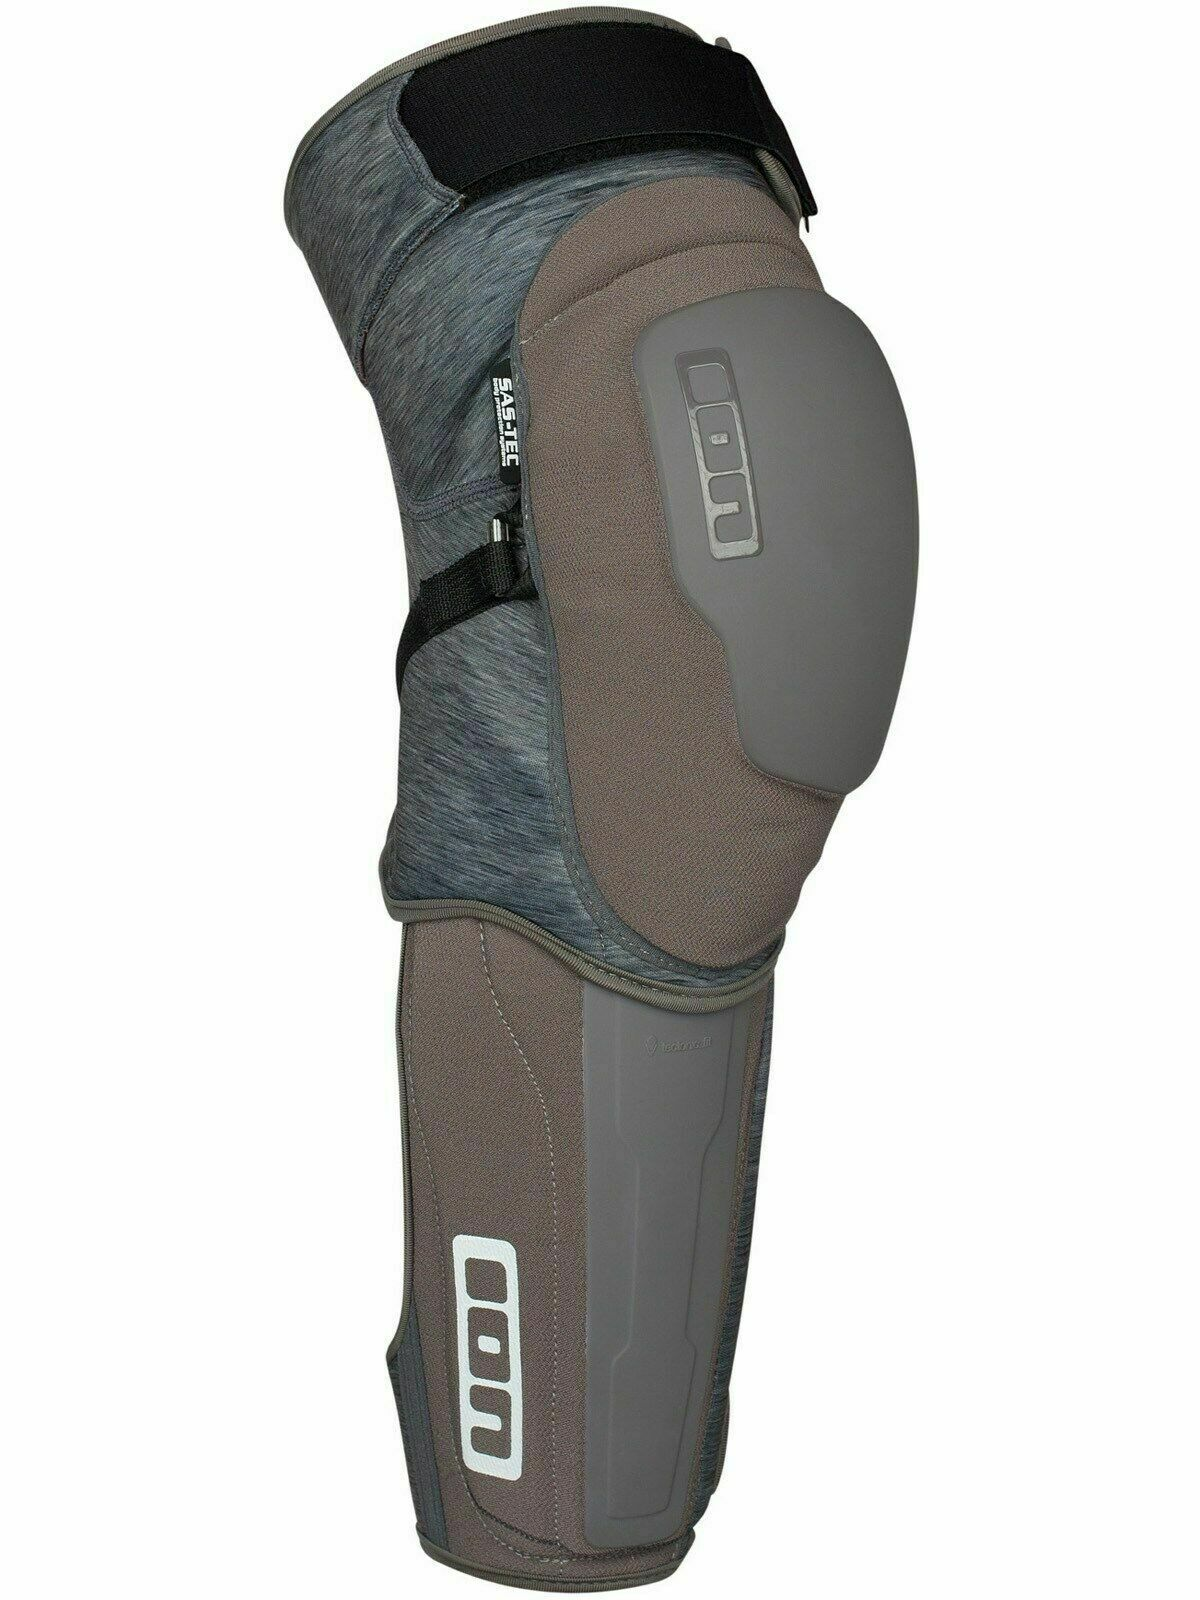 ION Knee Protection, K CAP EVO, grau Melange - XL